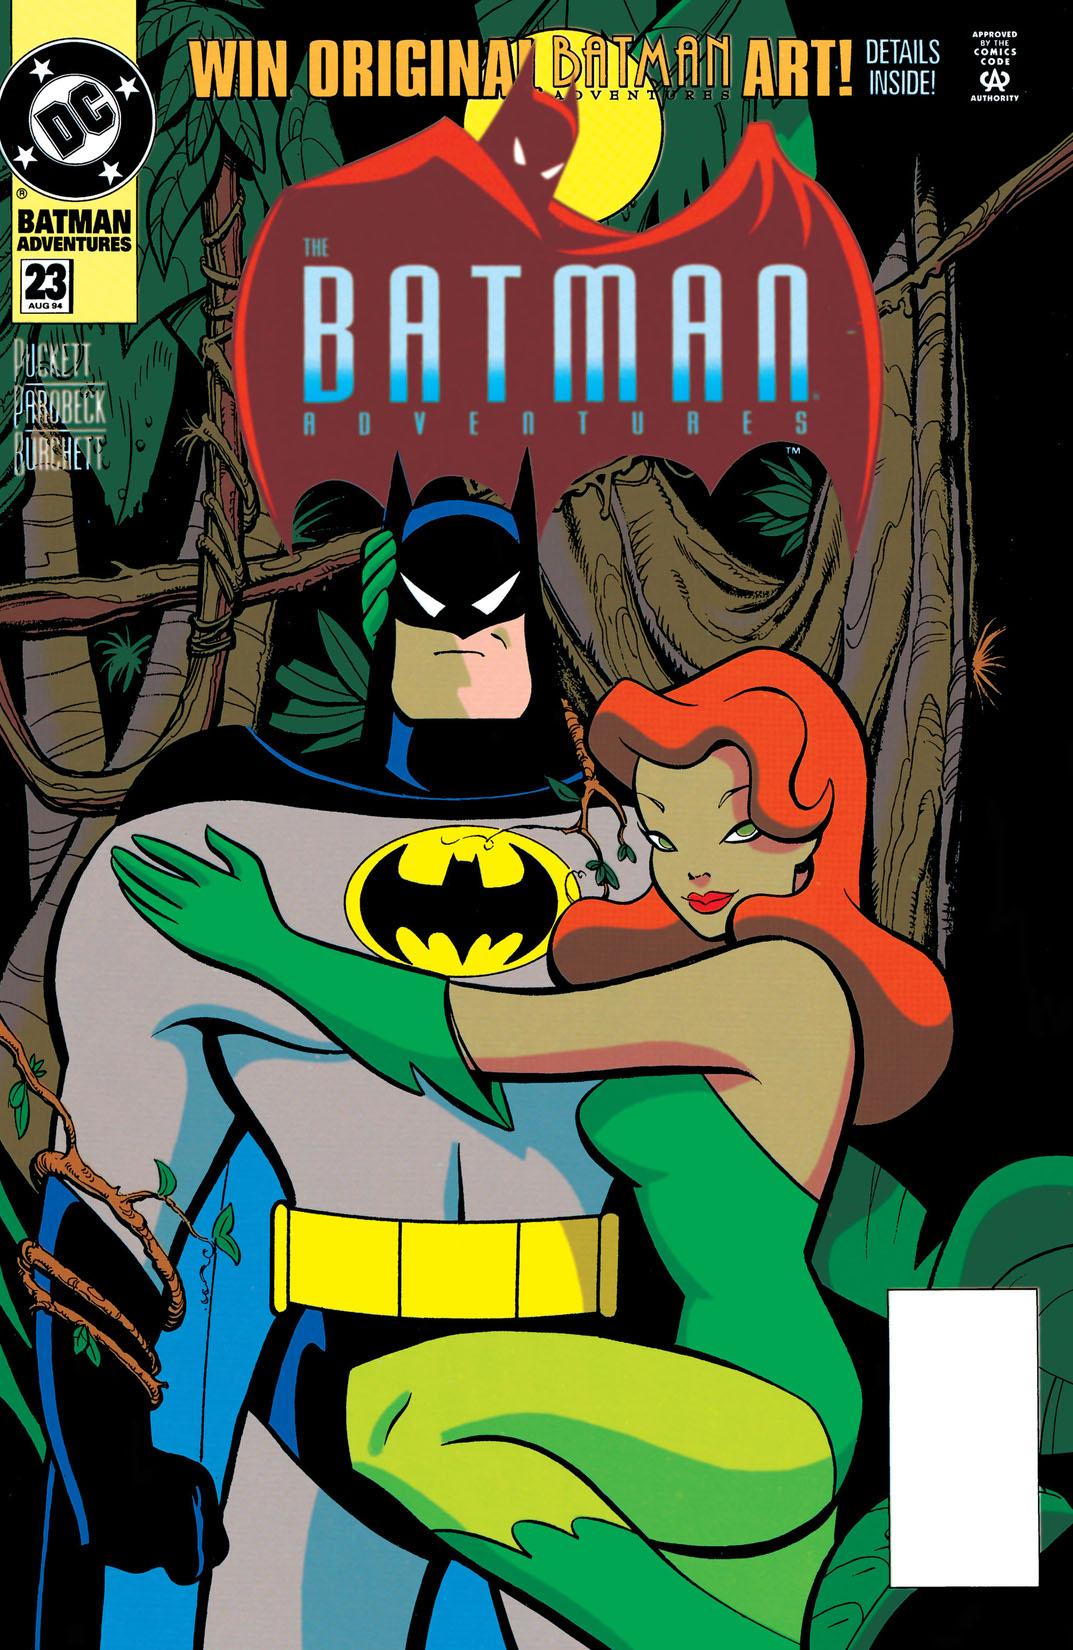 read the batman adventures 1992 23 on dc universe. Black Bedroom Furniture Sets. Home Design Ideas